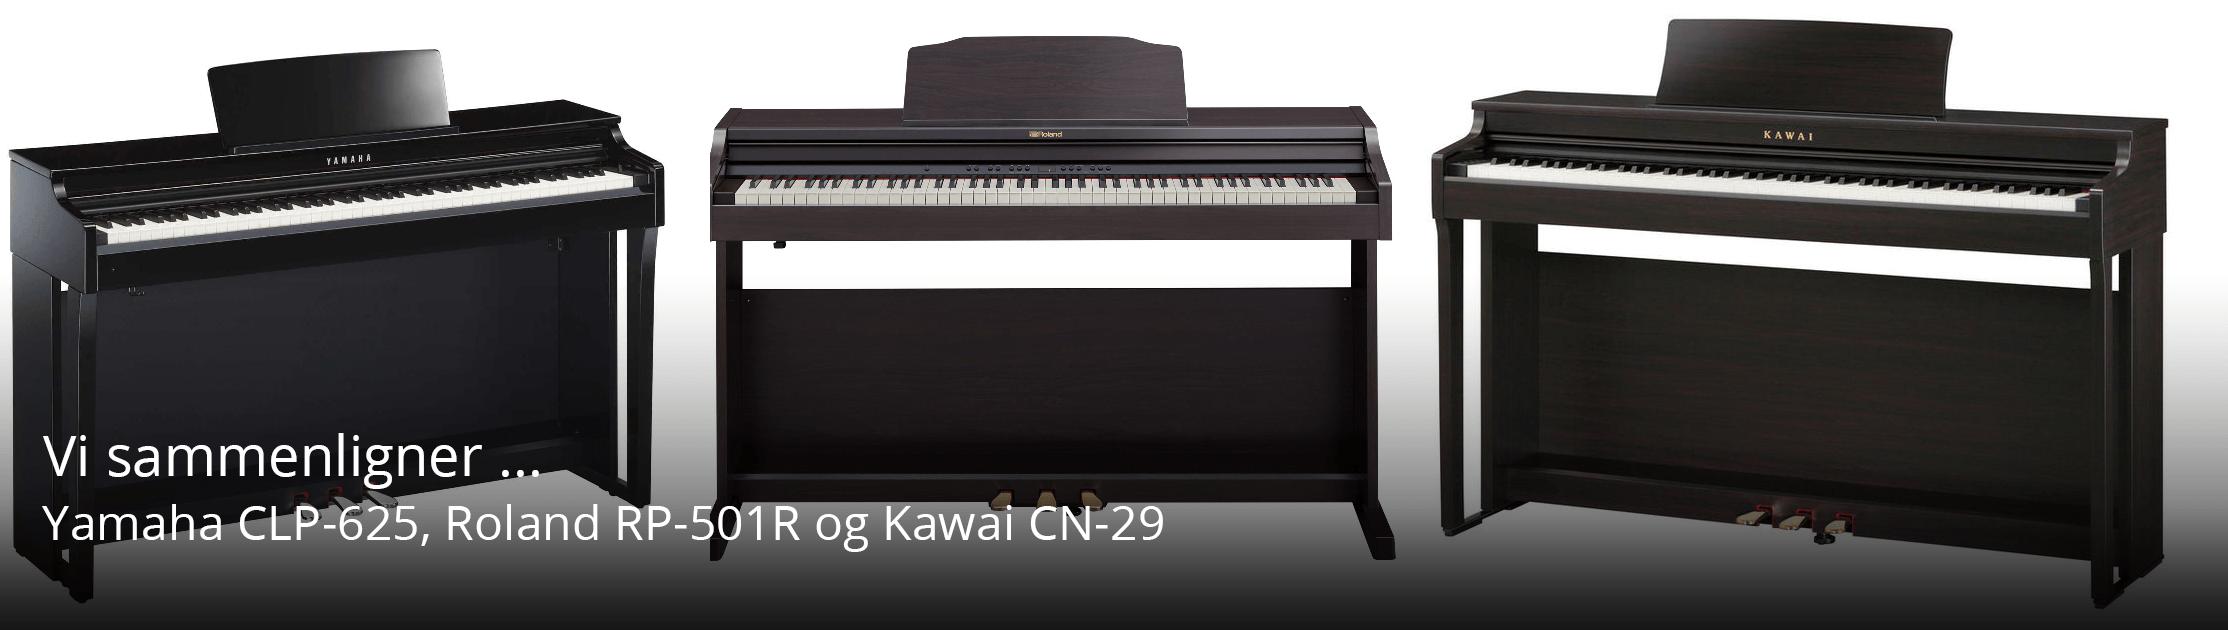 Kawai CN-29, Yamaha CLP-625, Roland RP-501R